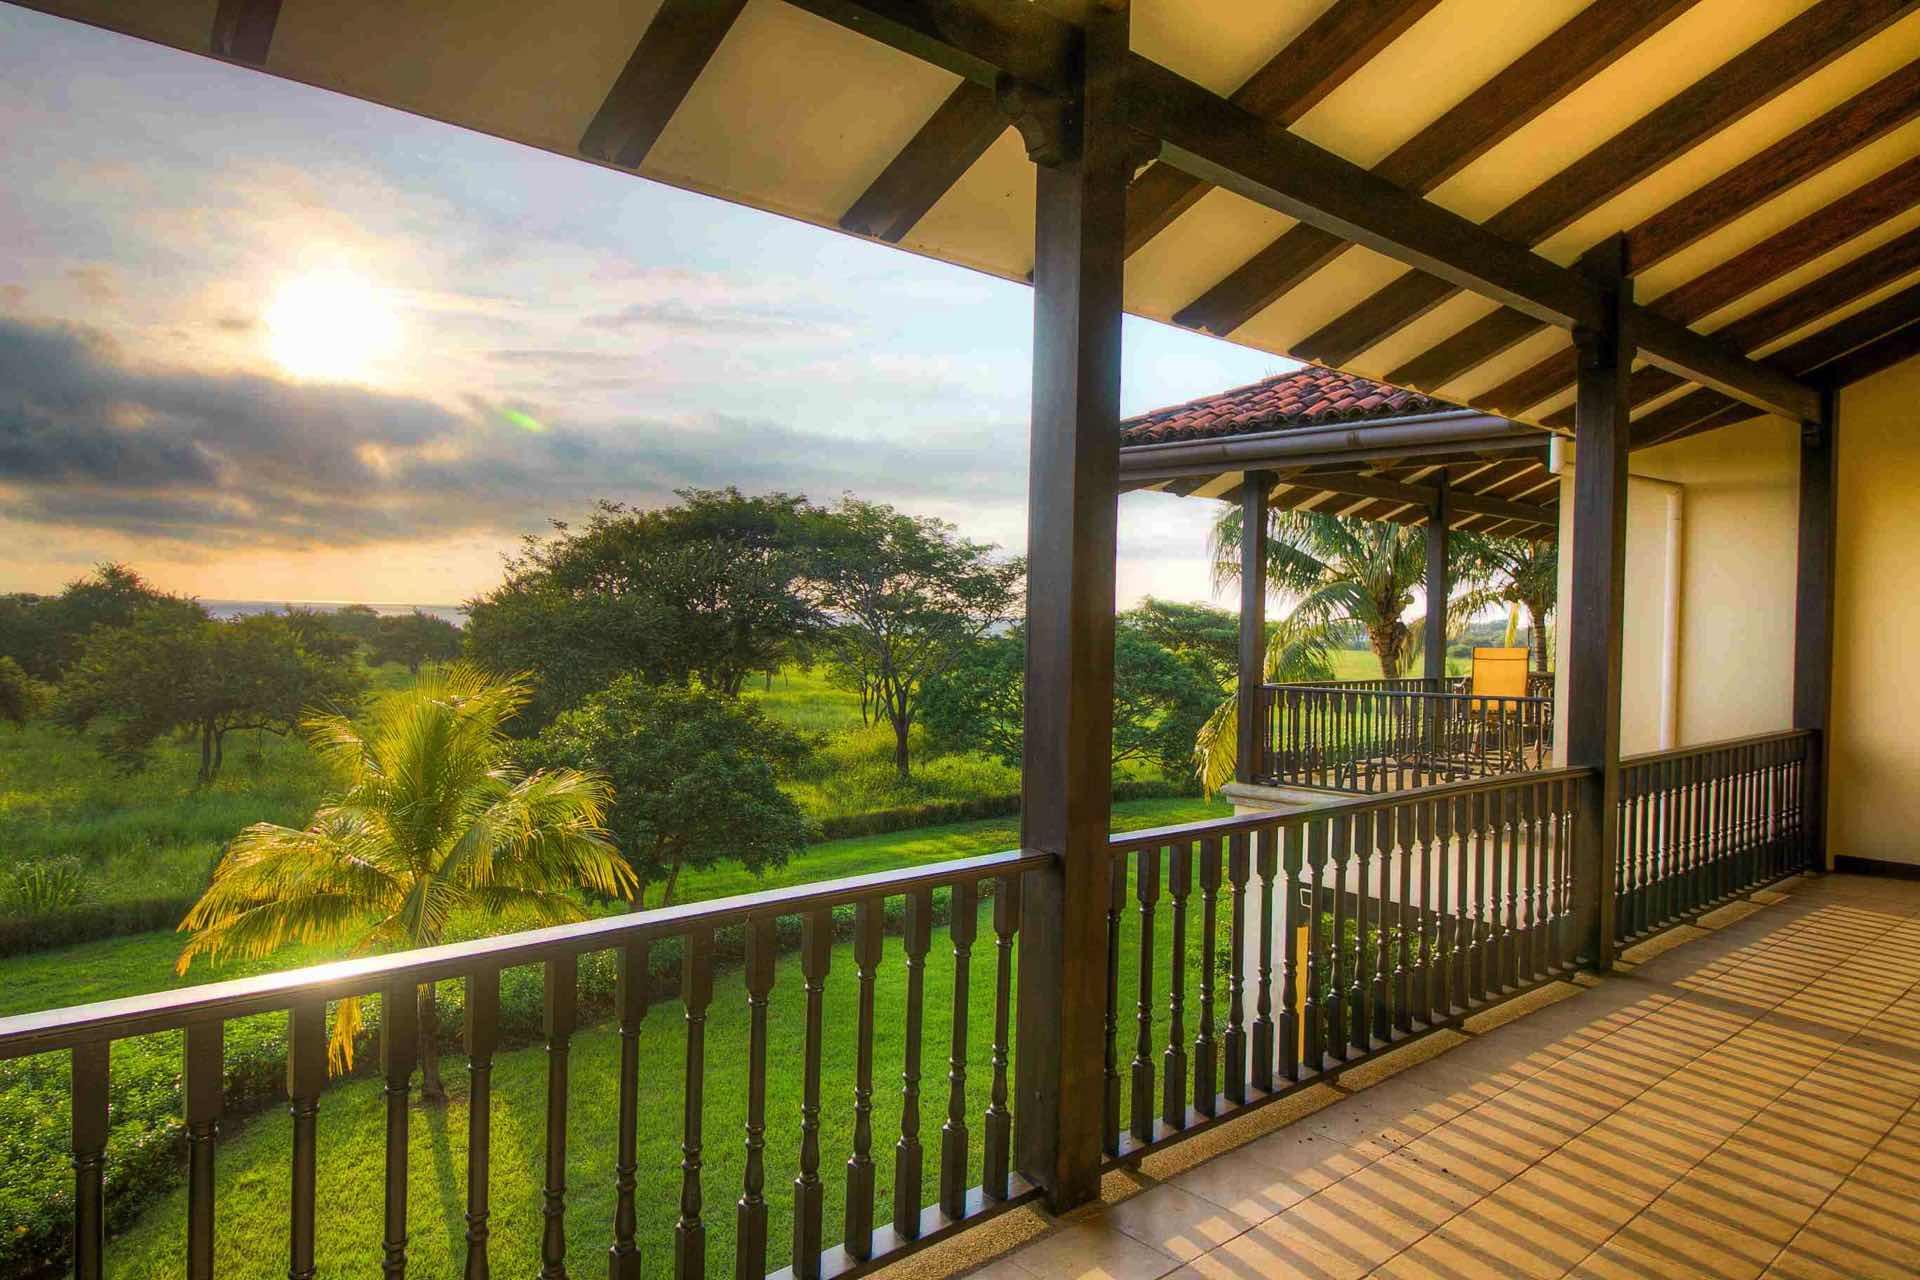 Enjoy sunsets from the balcony of Villa Mansita